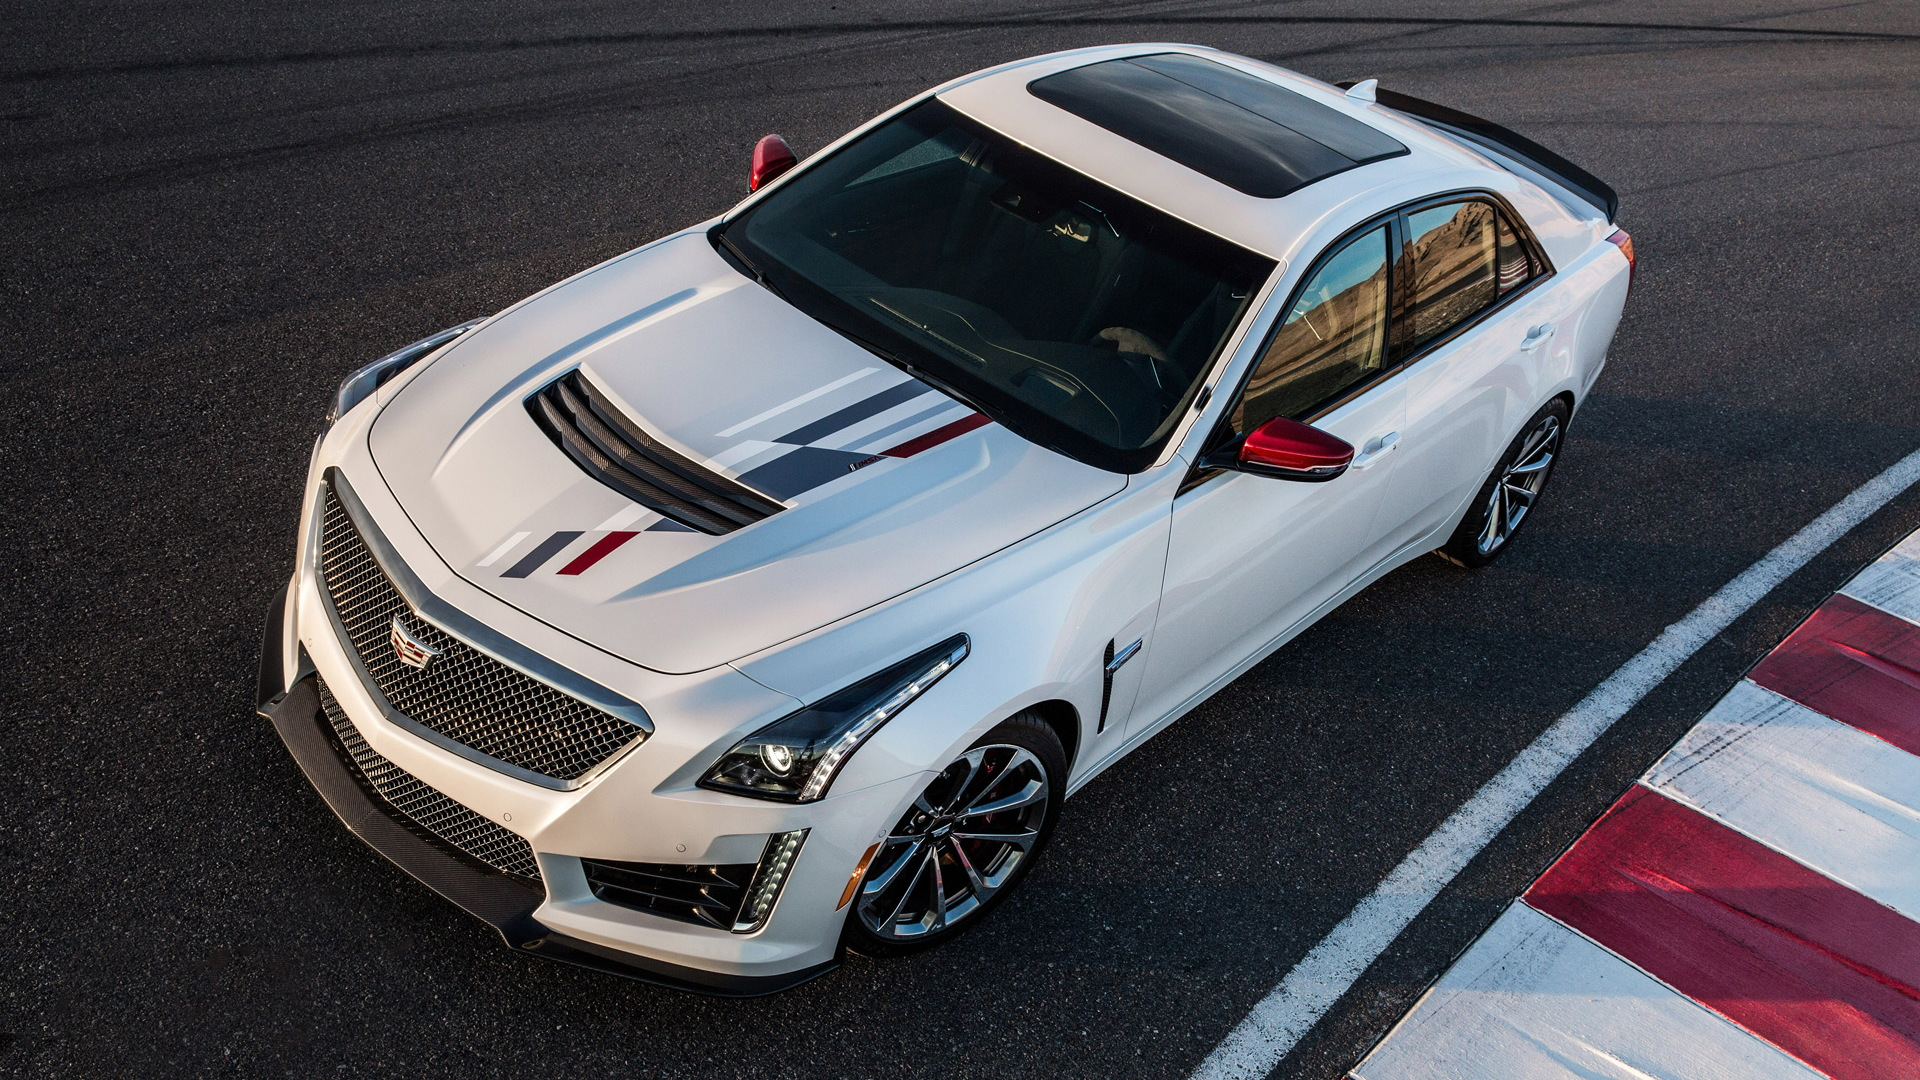 Car spy shots news reviews and insights motor authority - Cadillac cts v glacier metallic edition ...